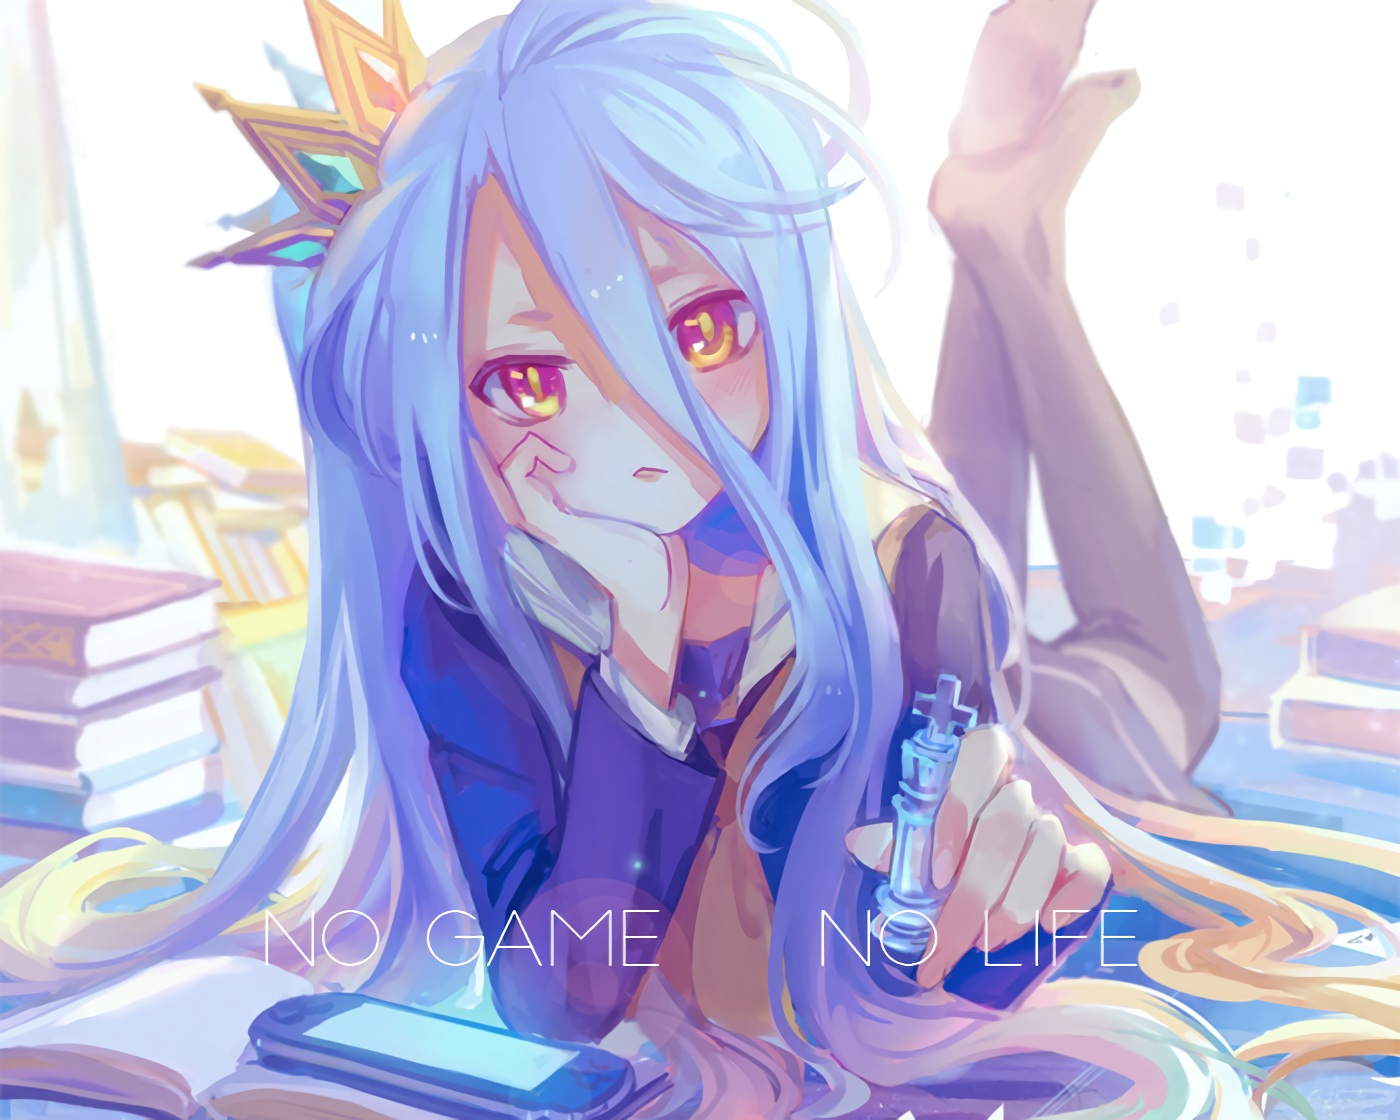 barefoot book cropped crown game_console kirayoci loli no_game_no_life orange_eyes school_uniform shiro_(no_game_no_life) thighhighs waifu2x white_hair